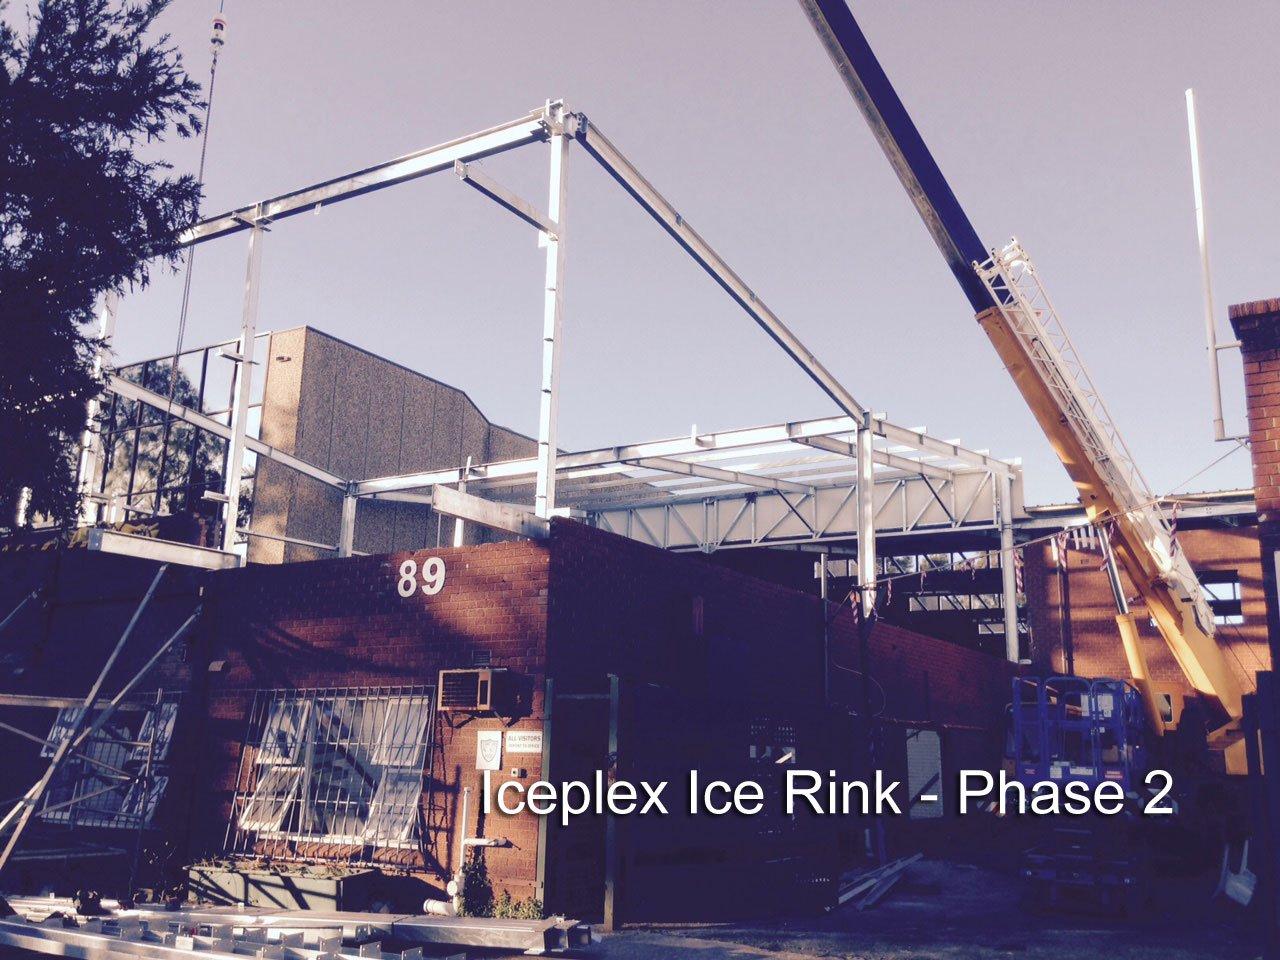 Iceplex-Phase-2